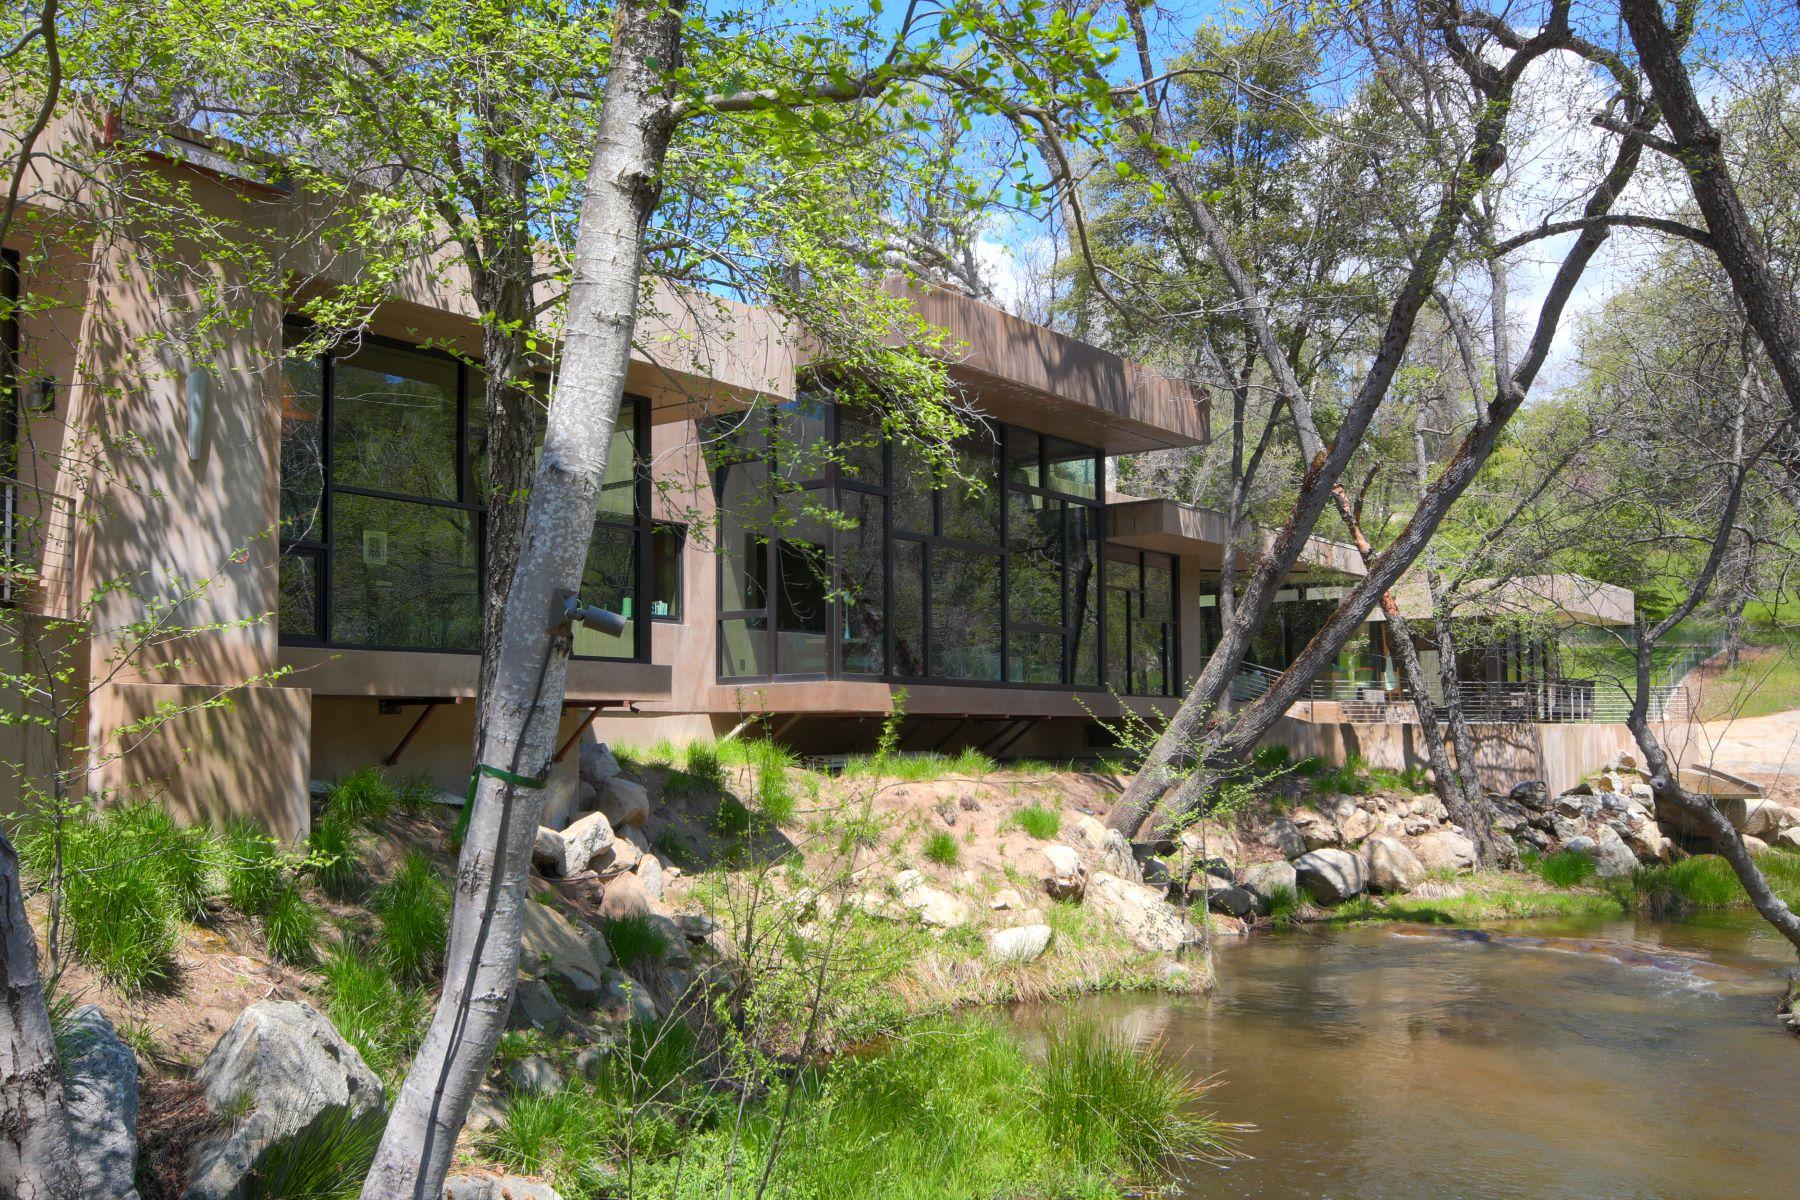 Single Family Homes for Active at Glen Eden at Yosemite 42411 Hwy 41 Oakhurst, California 93644 United States